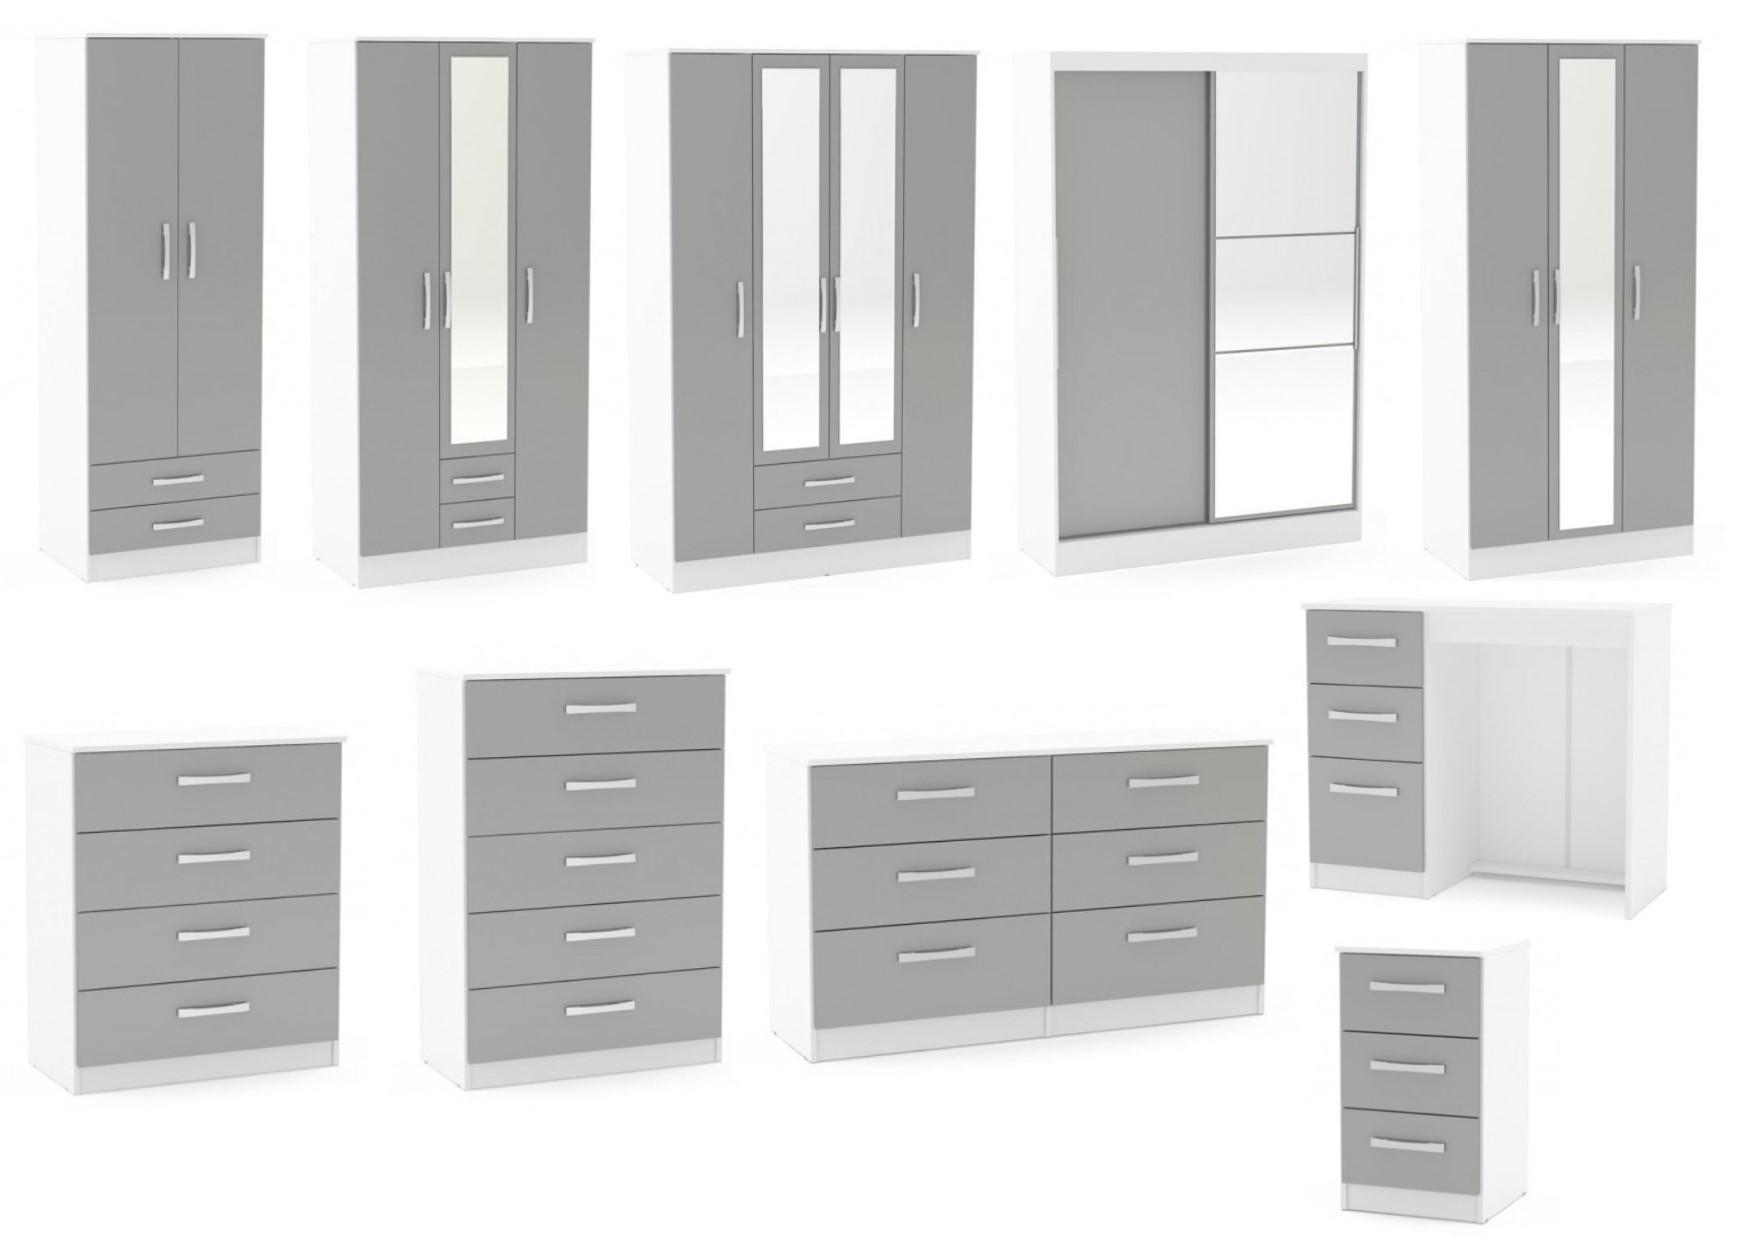 Birlea Lynx White & Grey Gloss Bedroom Furniture Wardrobe Chest ...